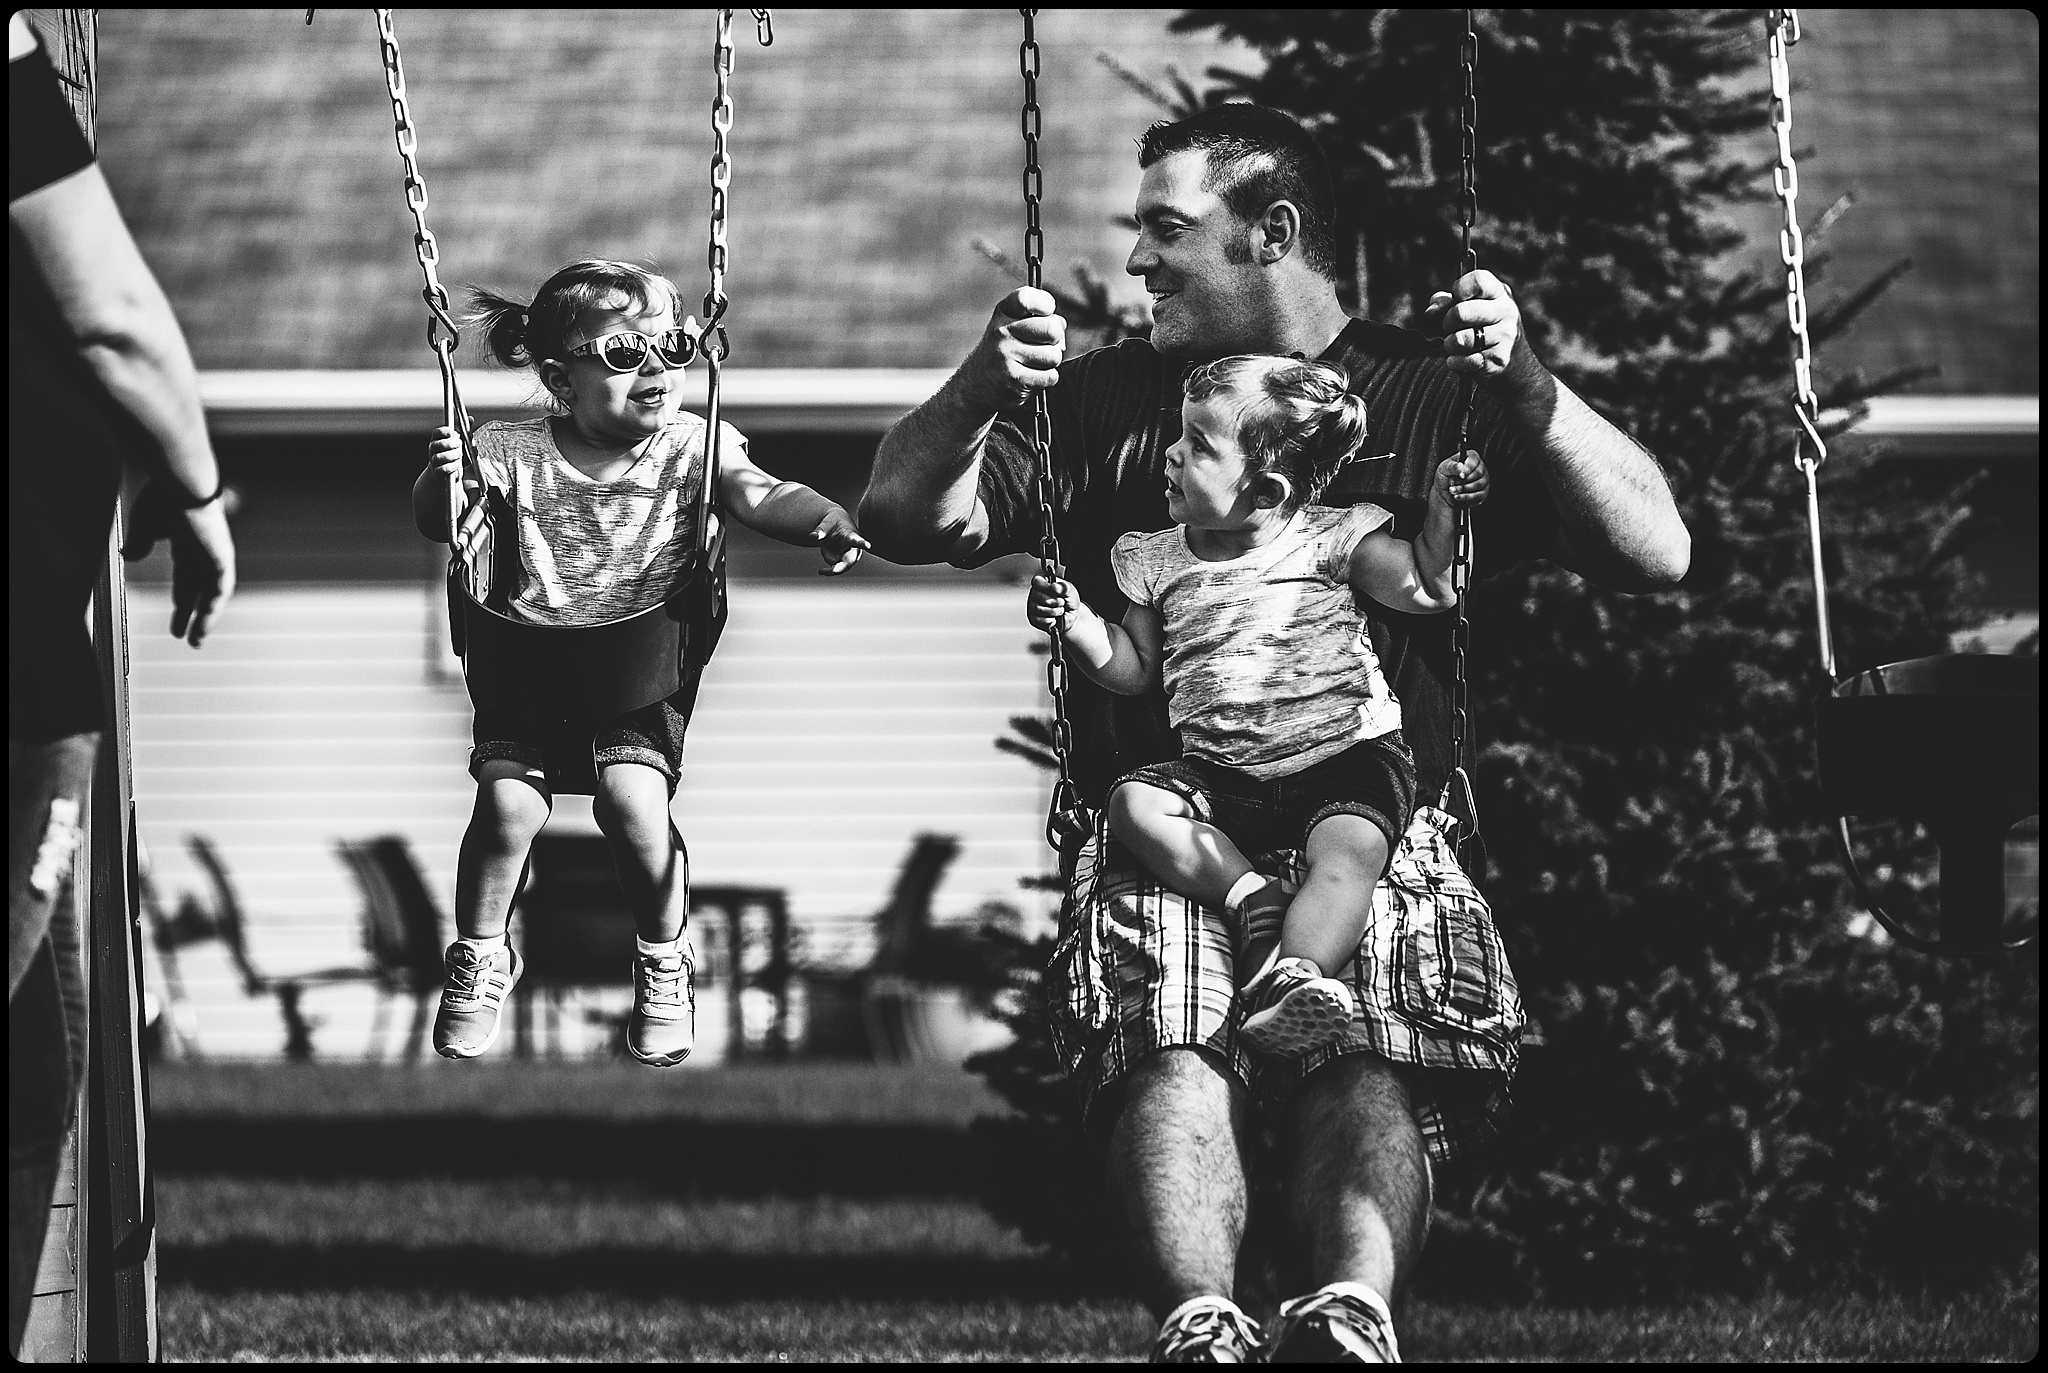 Wisconsin_Rapids_Family_Photos_Bobbi_K_Photography_0001.jpg